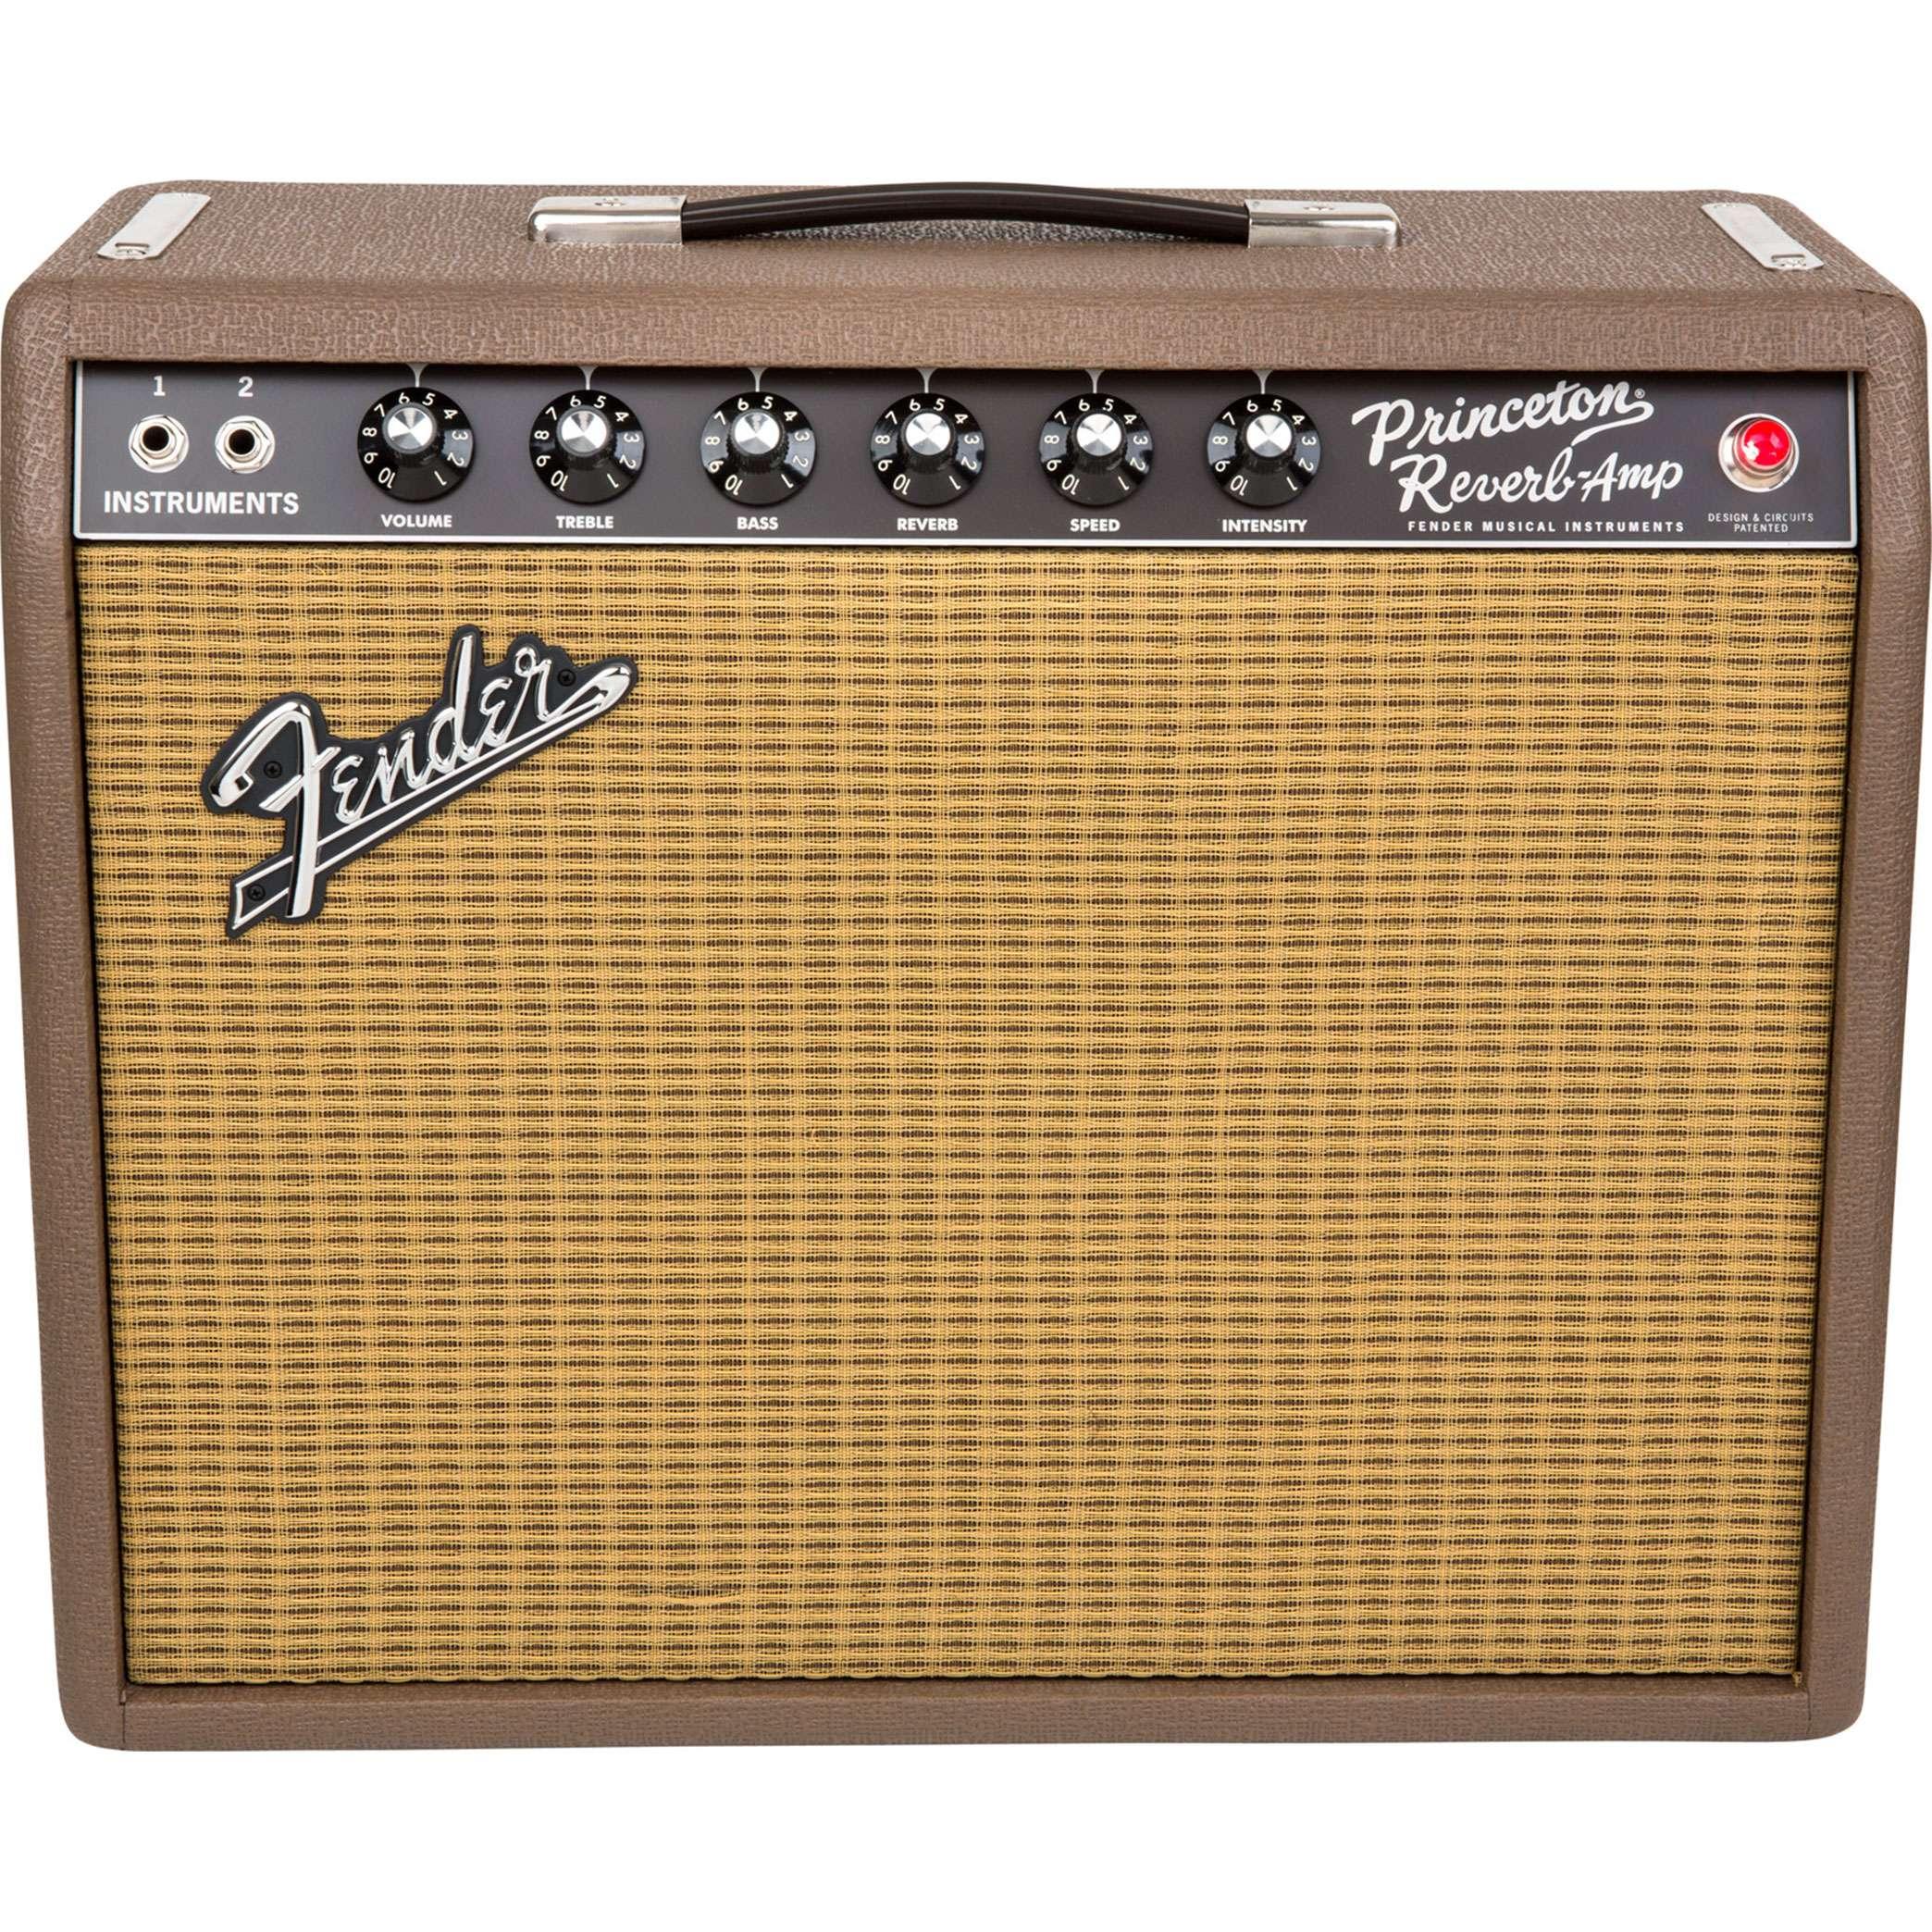 Fender Princeton Reverb FSR 1 1280x1280 2x